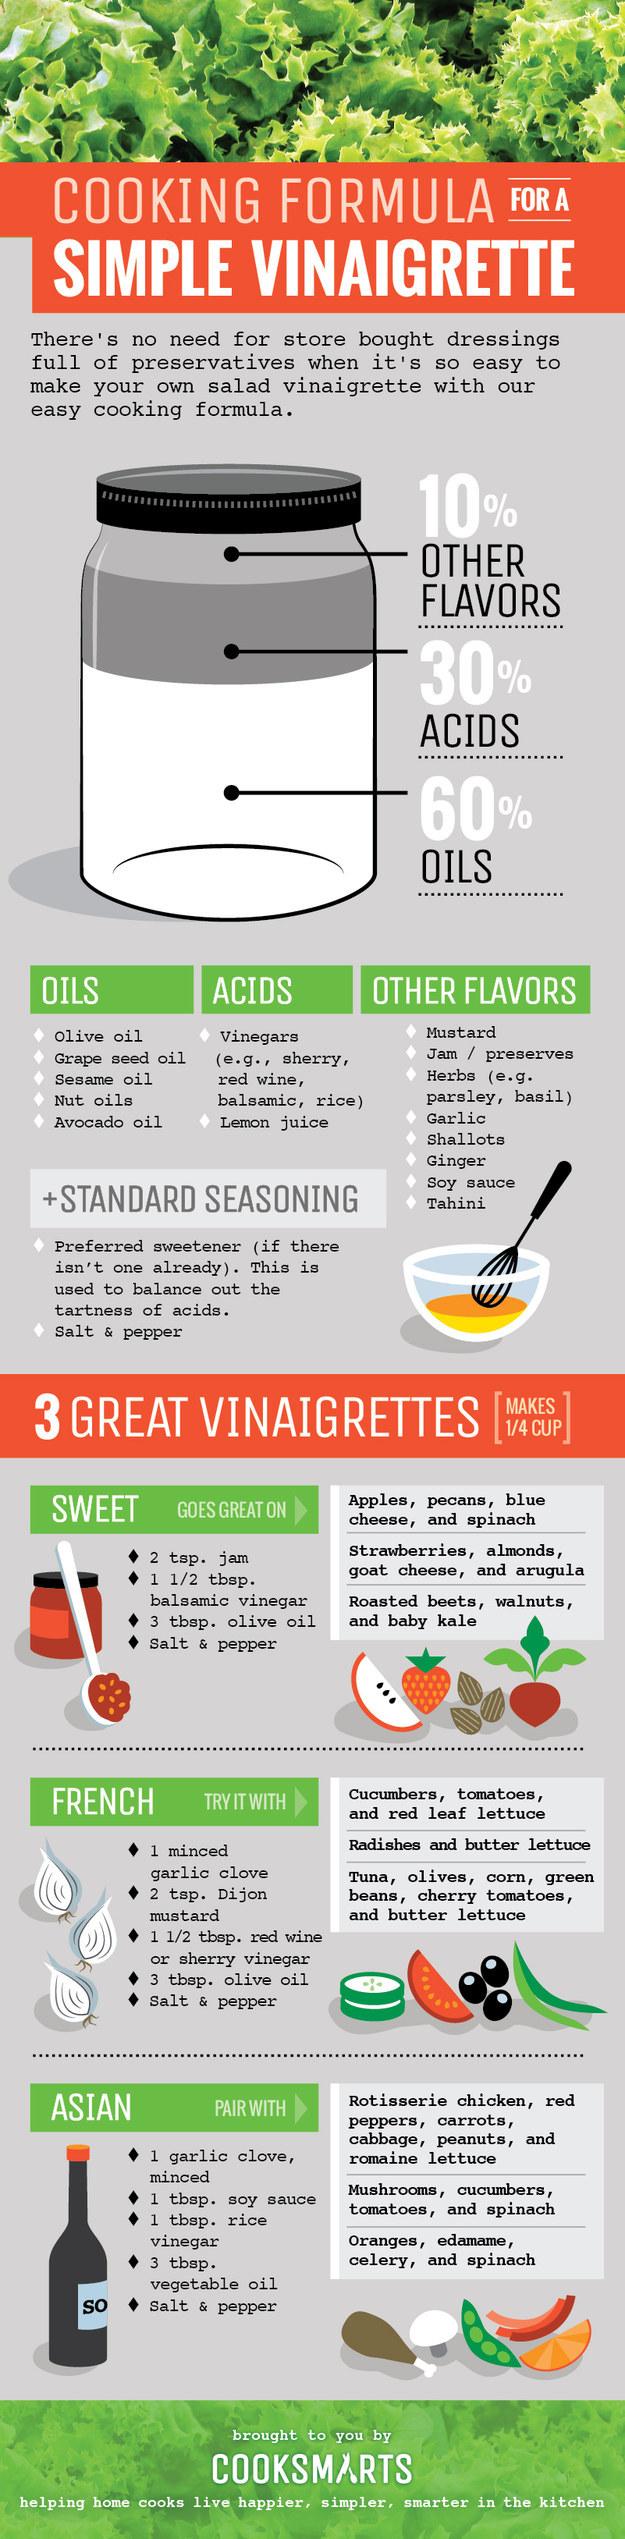 cooking formula for a simple vinaigrette